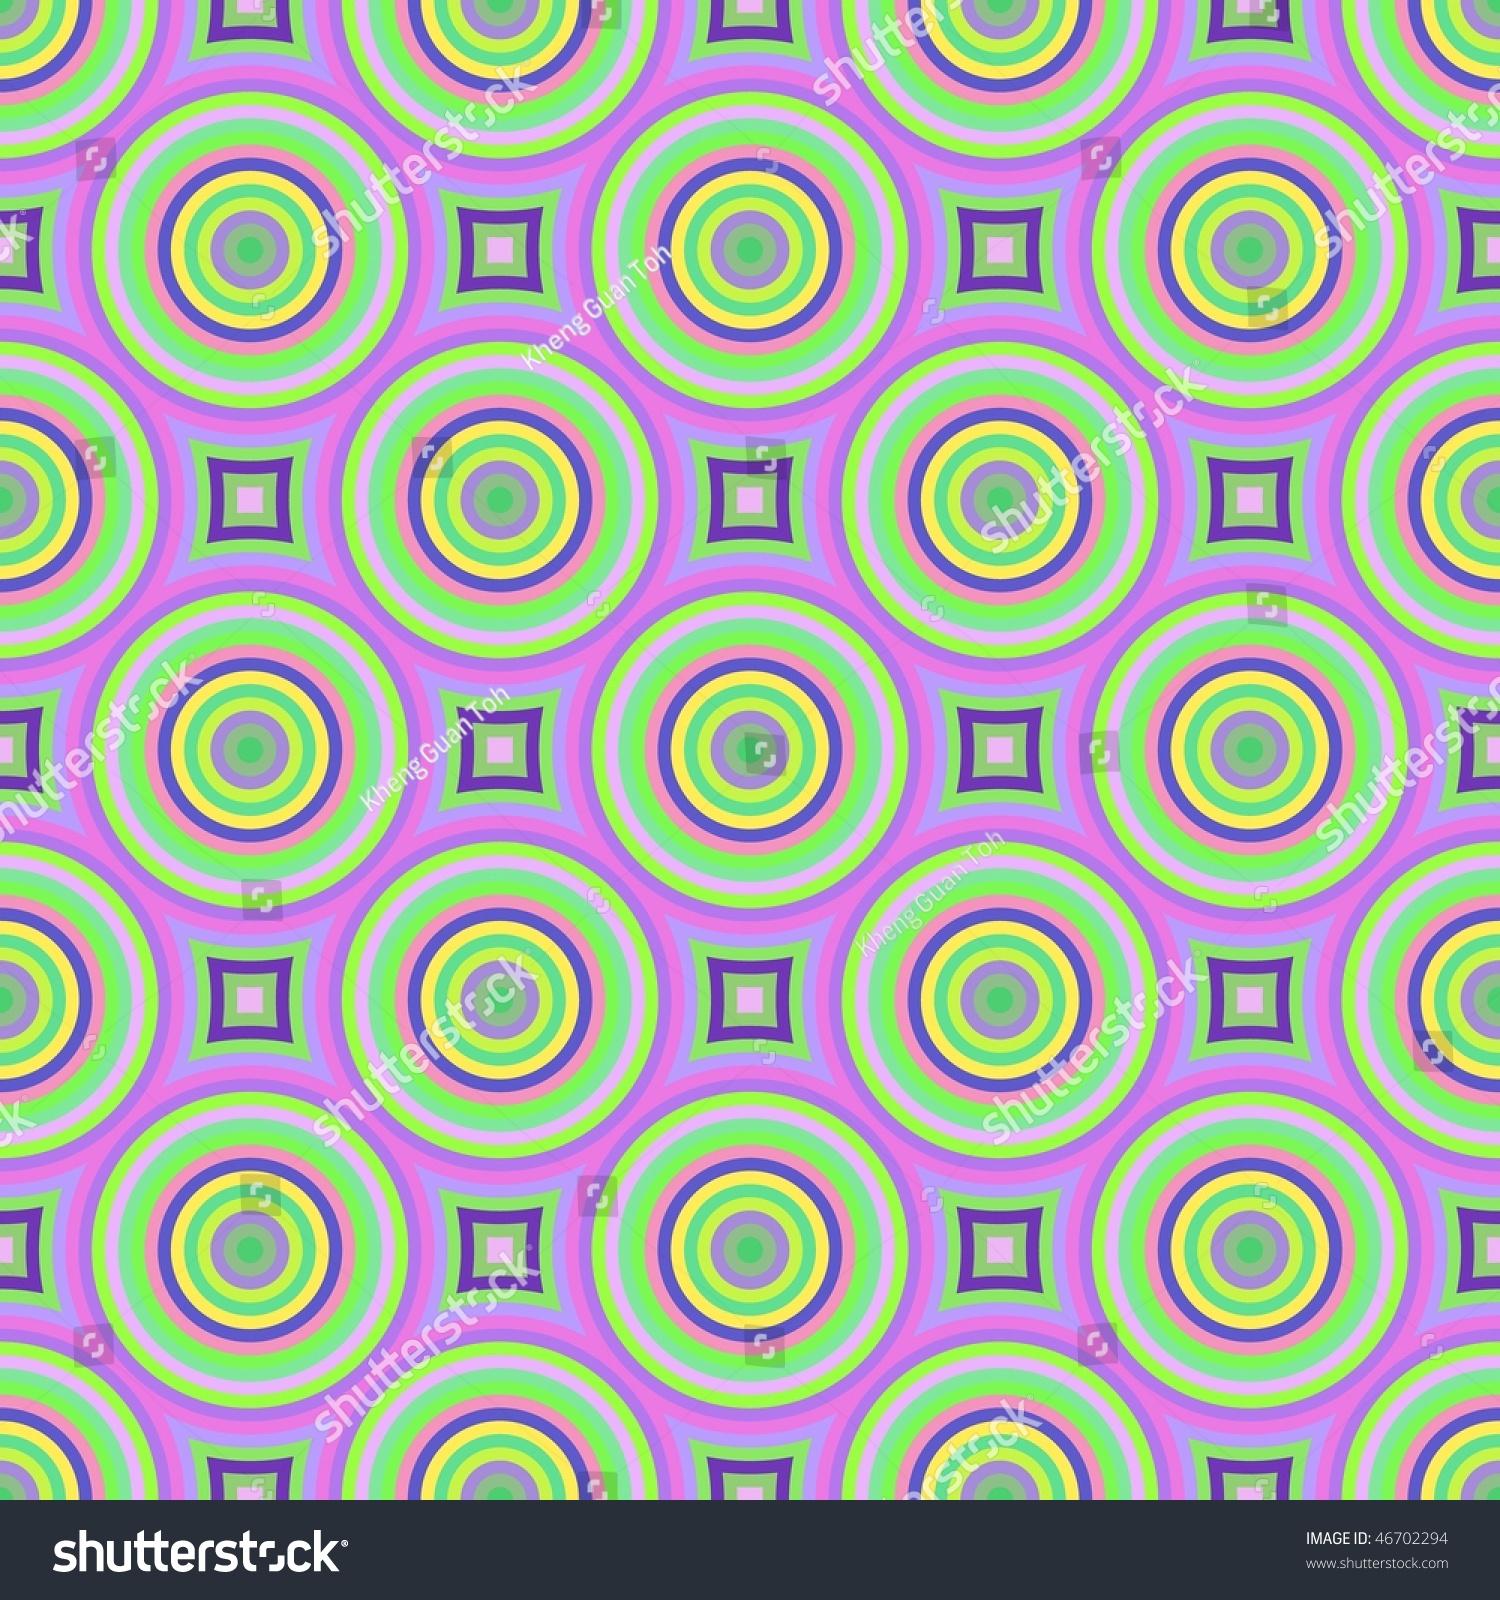 Colorful vintage background patterns - photo#18